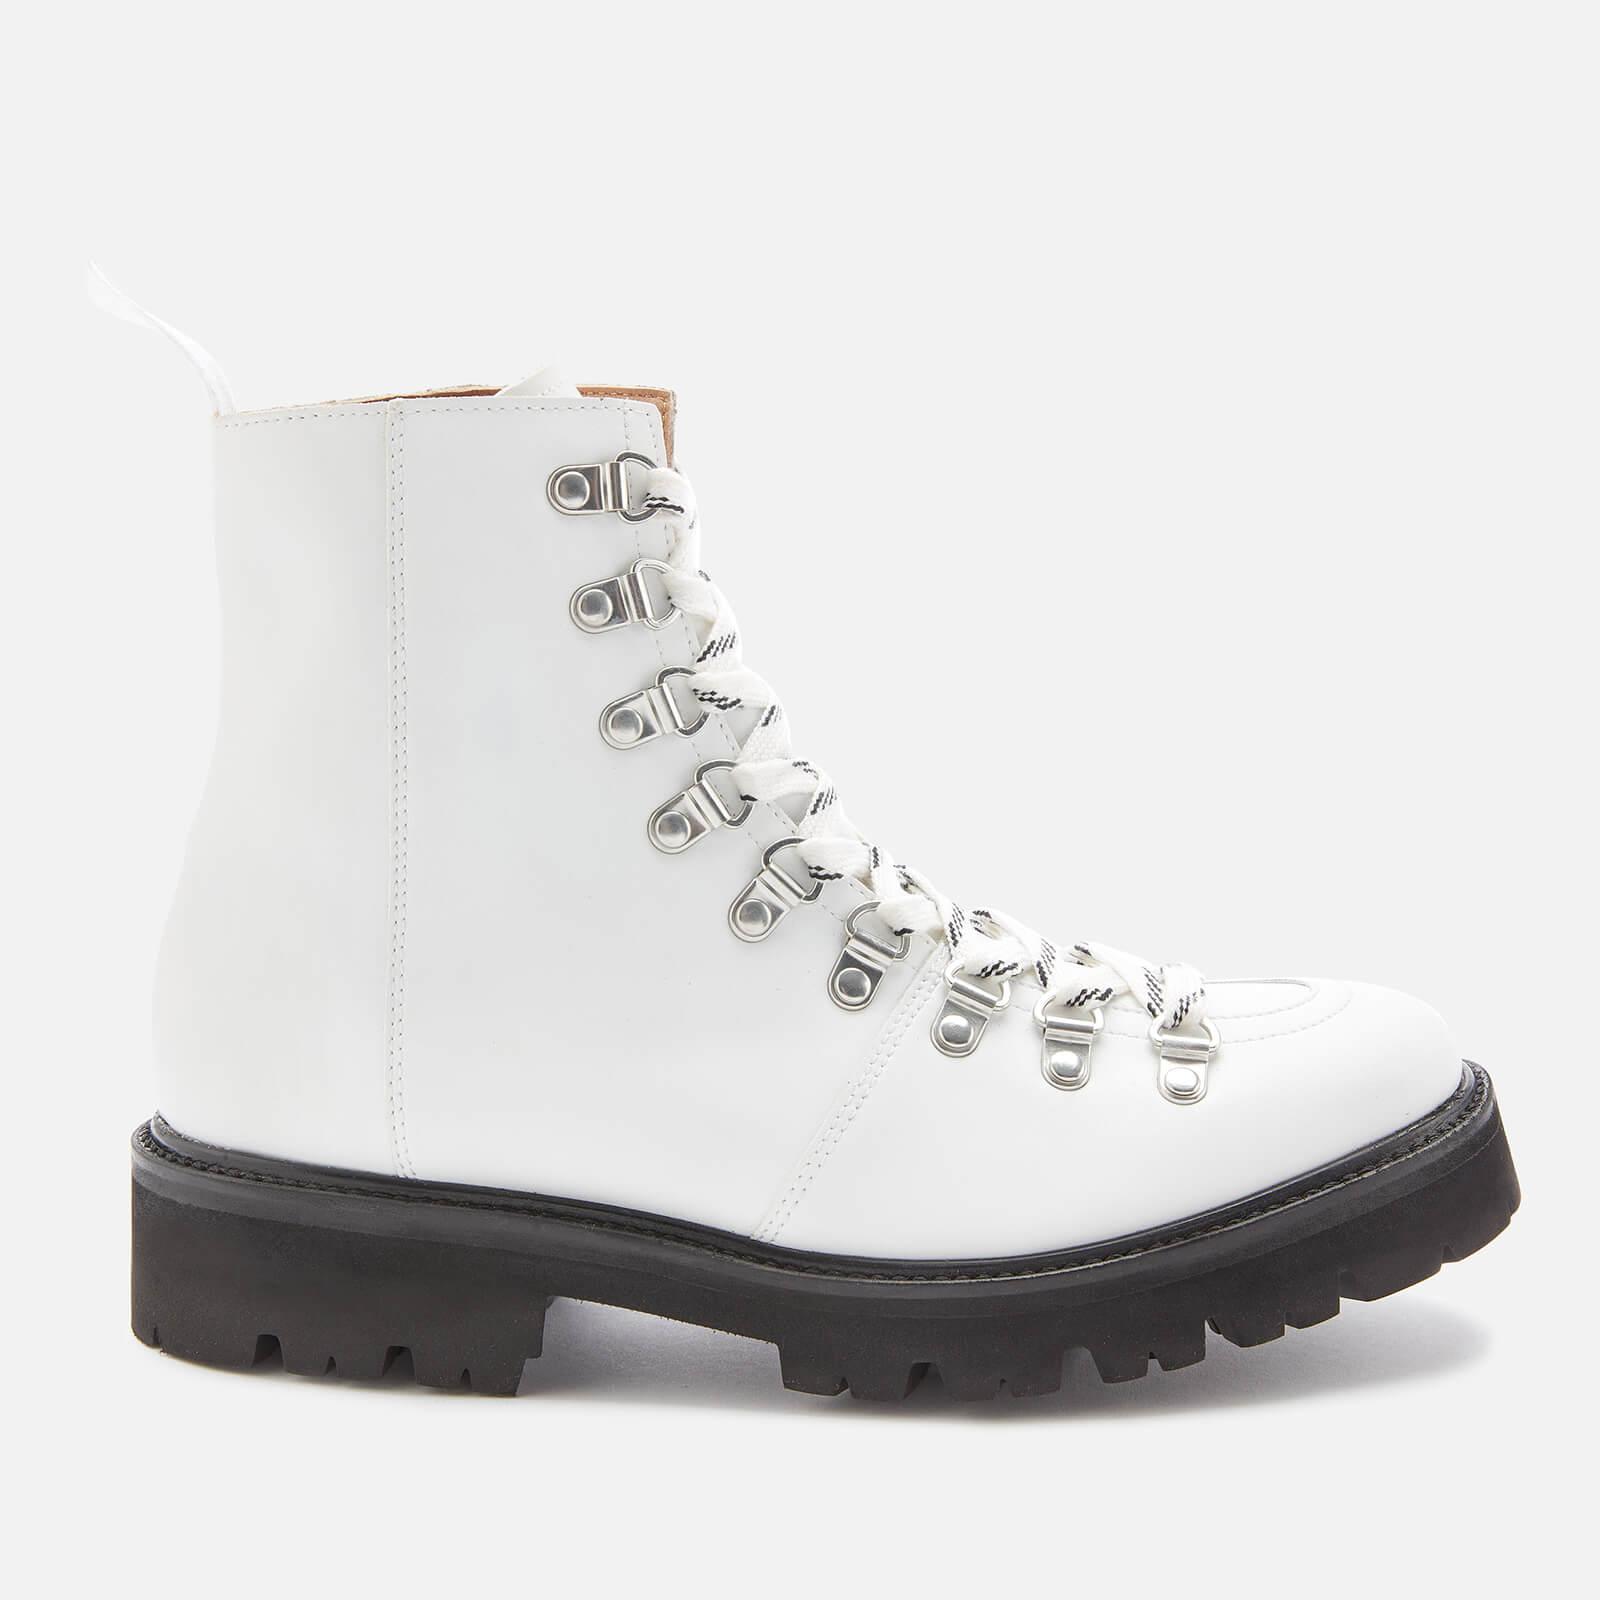 Grenson Women's Nanette Vegan Hiking Style Boots - White - Uk 3